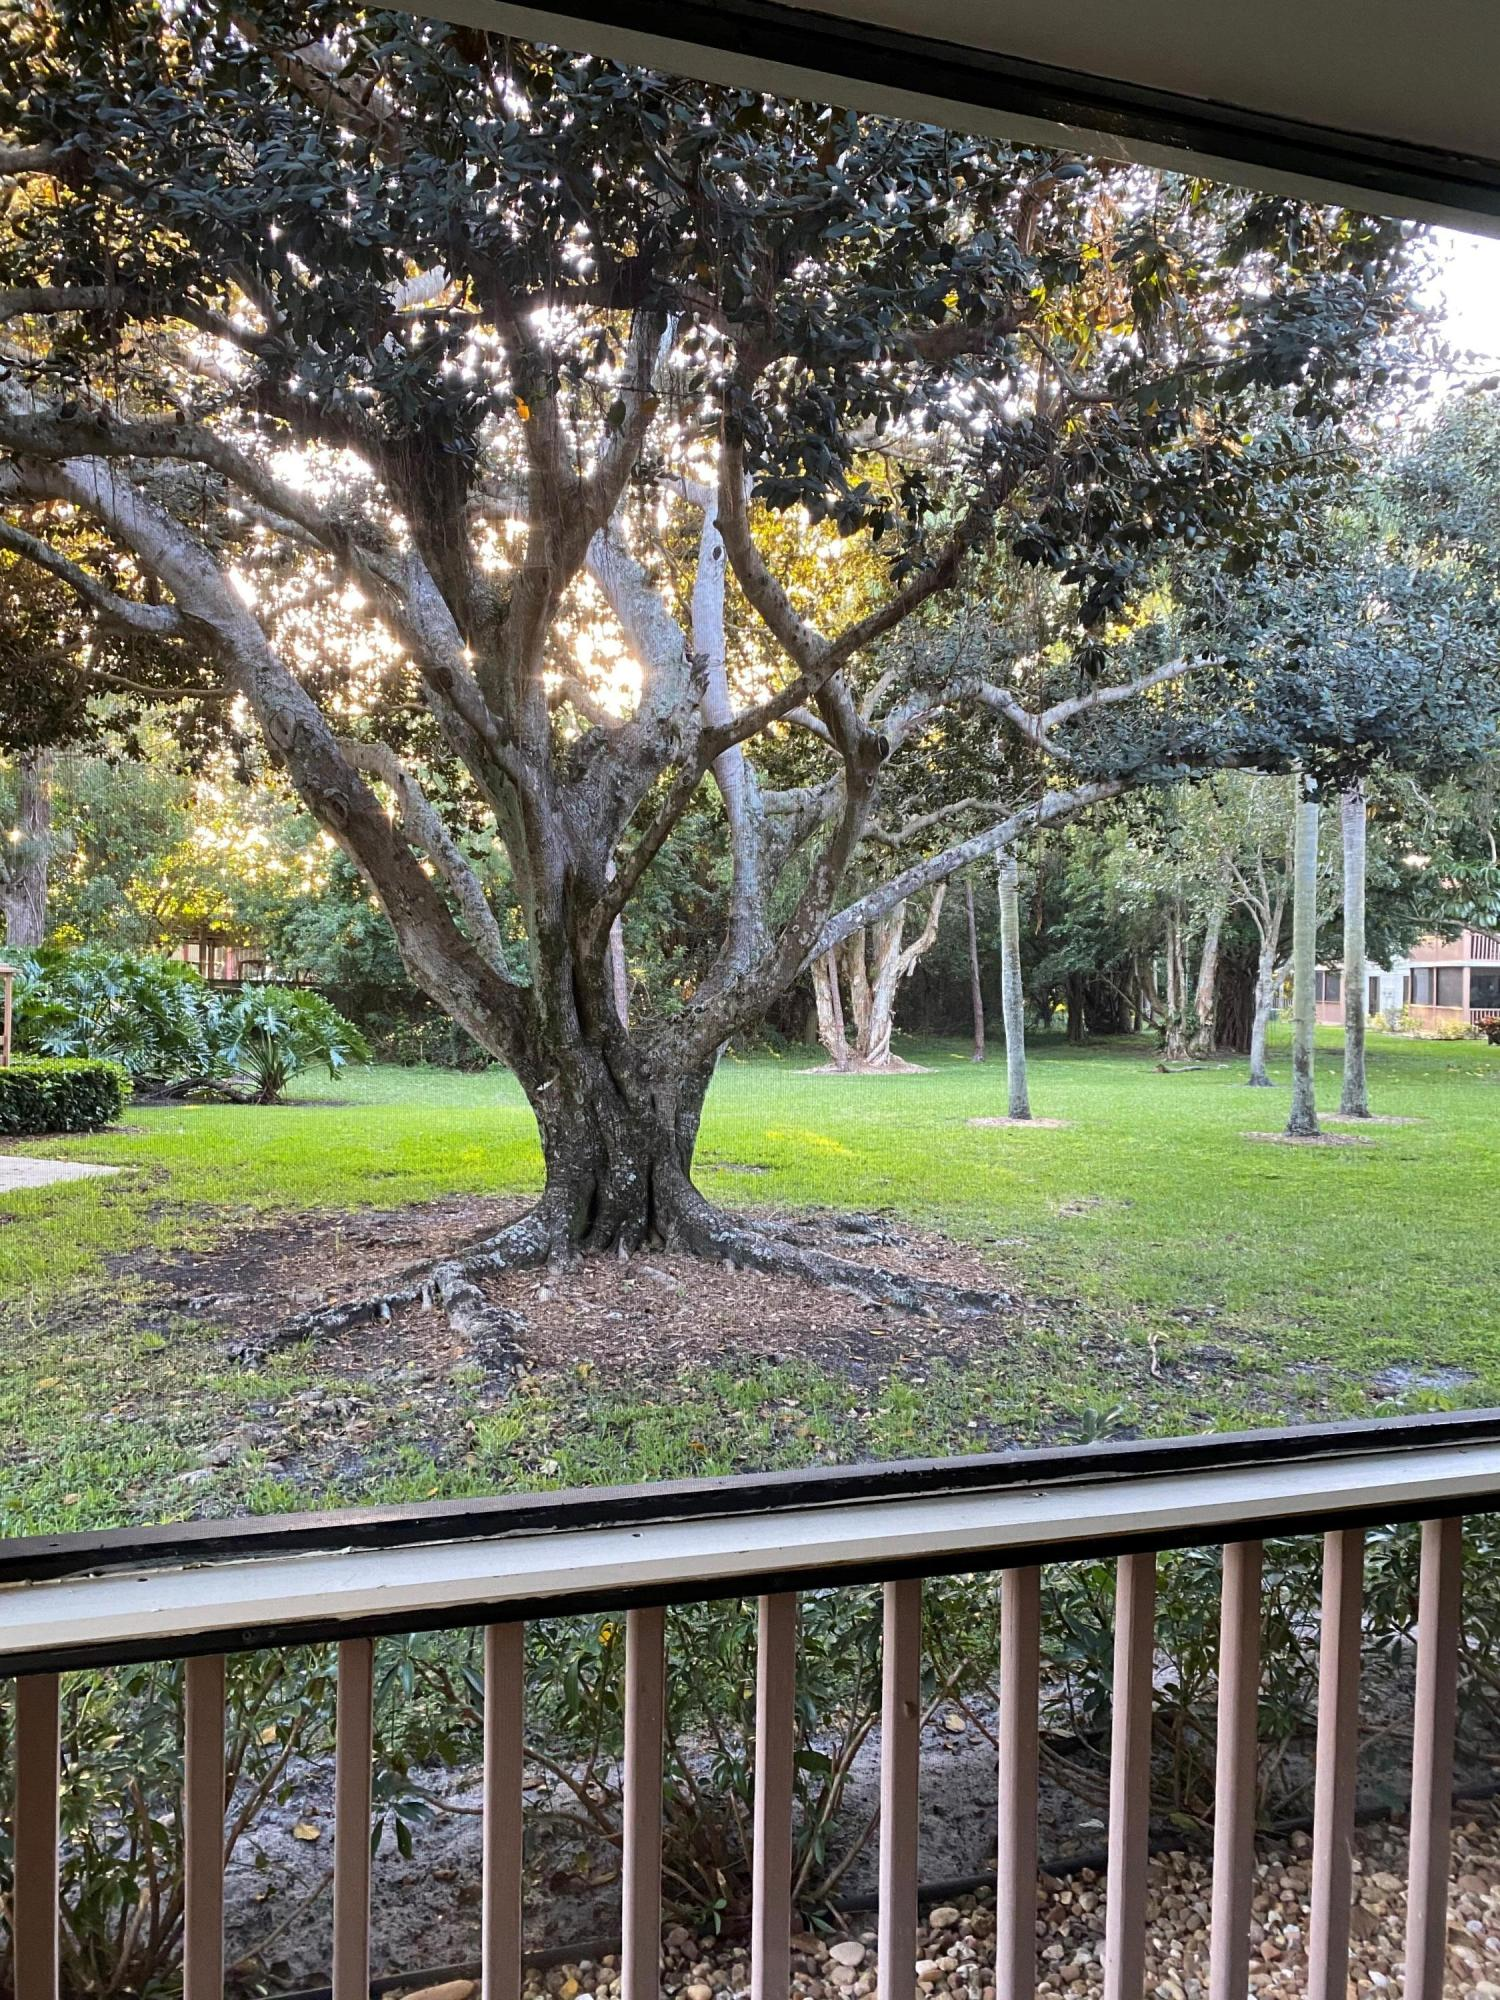 128 Brackenwood Road, Palm Beach Gardens, Florida 33418, 2 Bedrooms Bedrooms, ,2 BathroomsBathrooms,A,Condominium,Brackenwood,RX-10609872